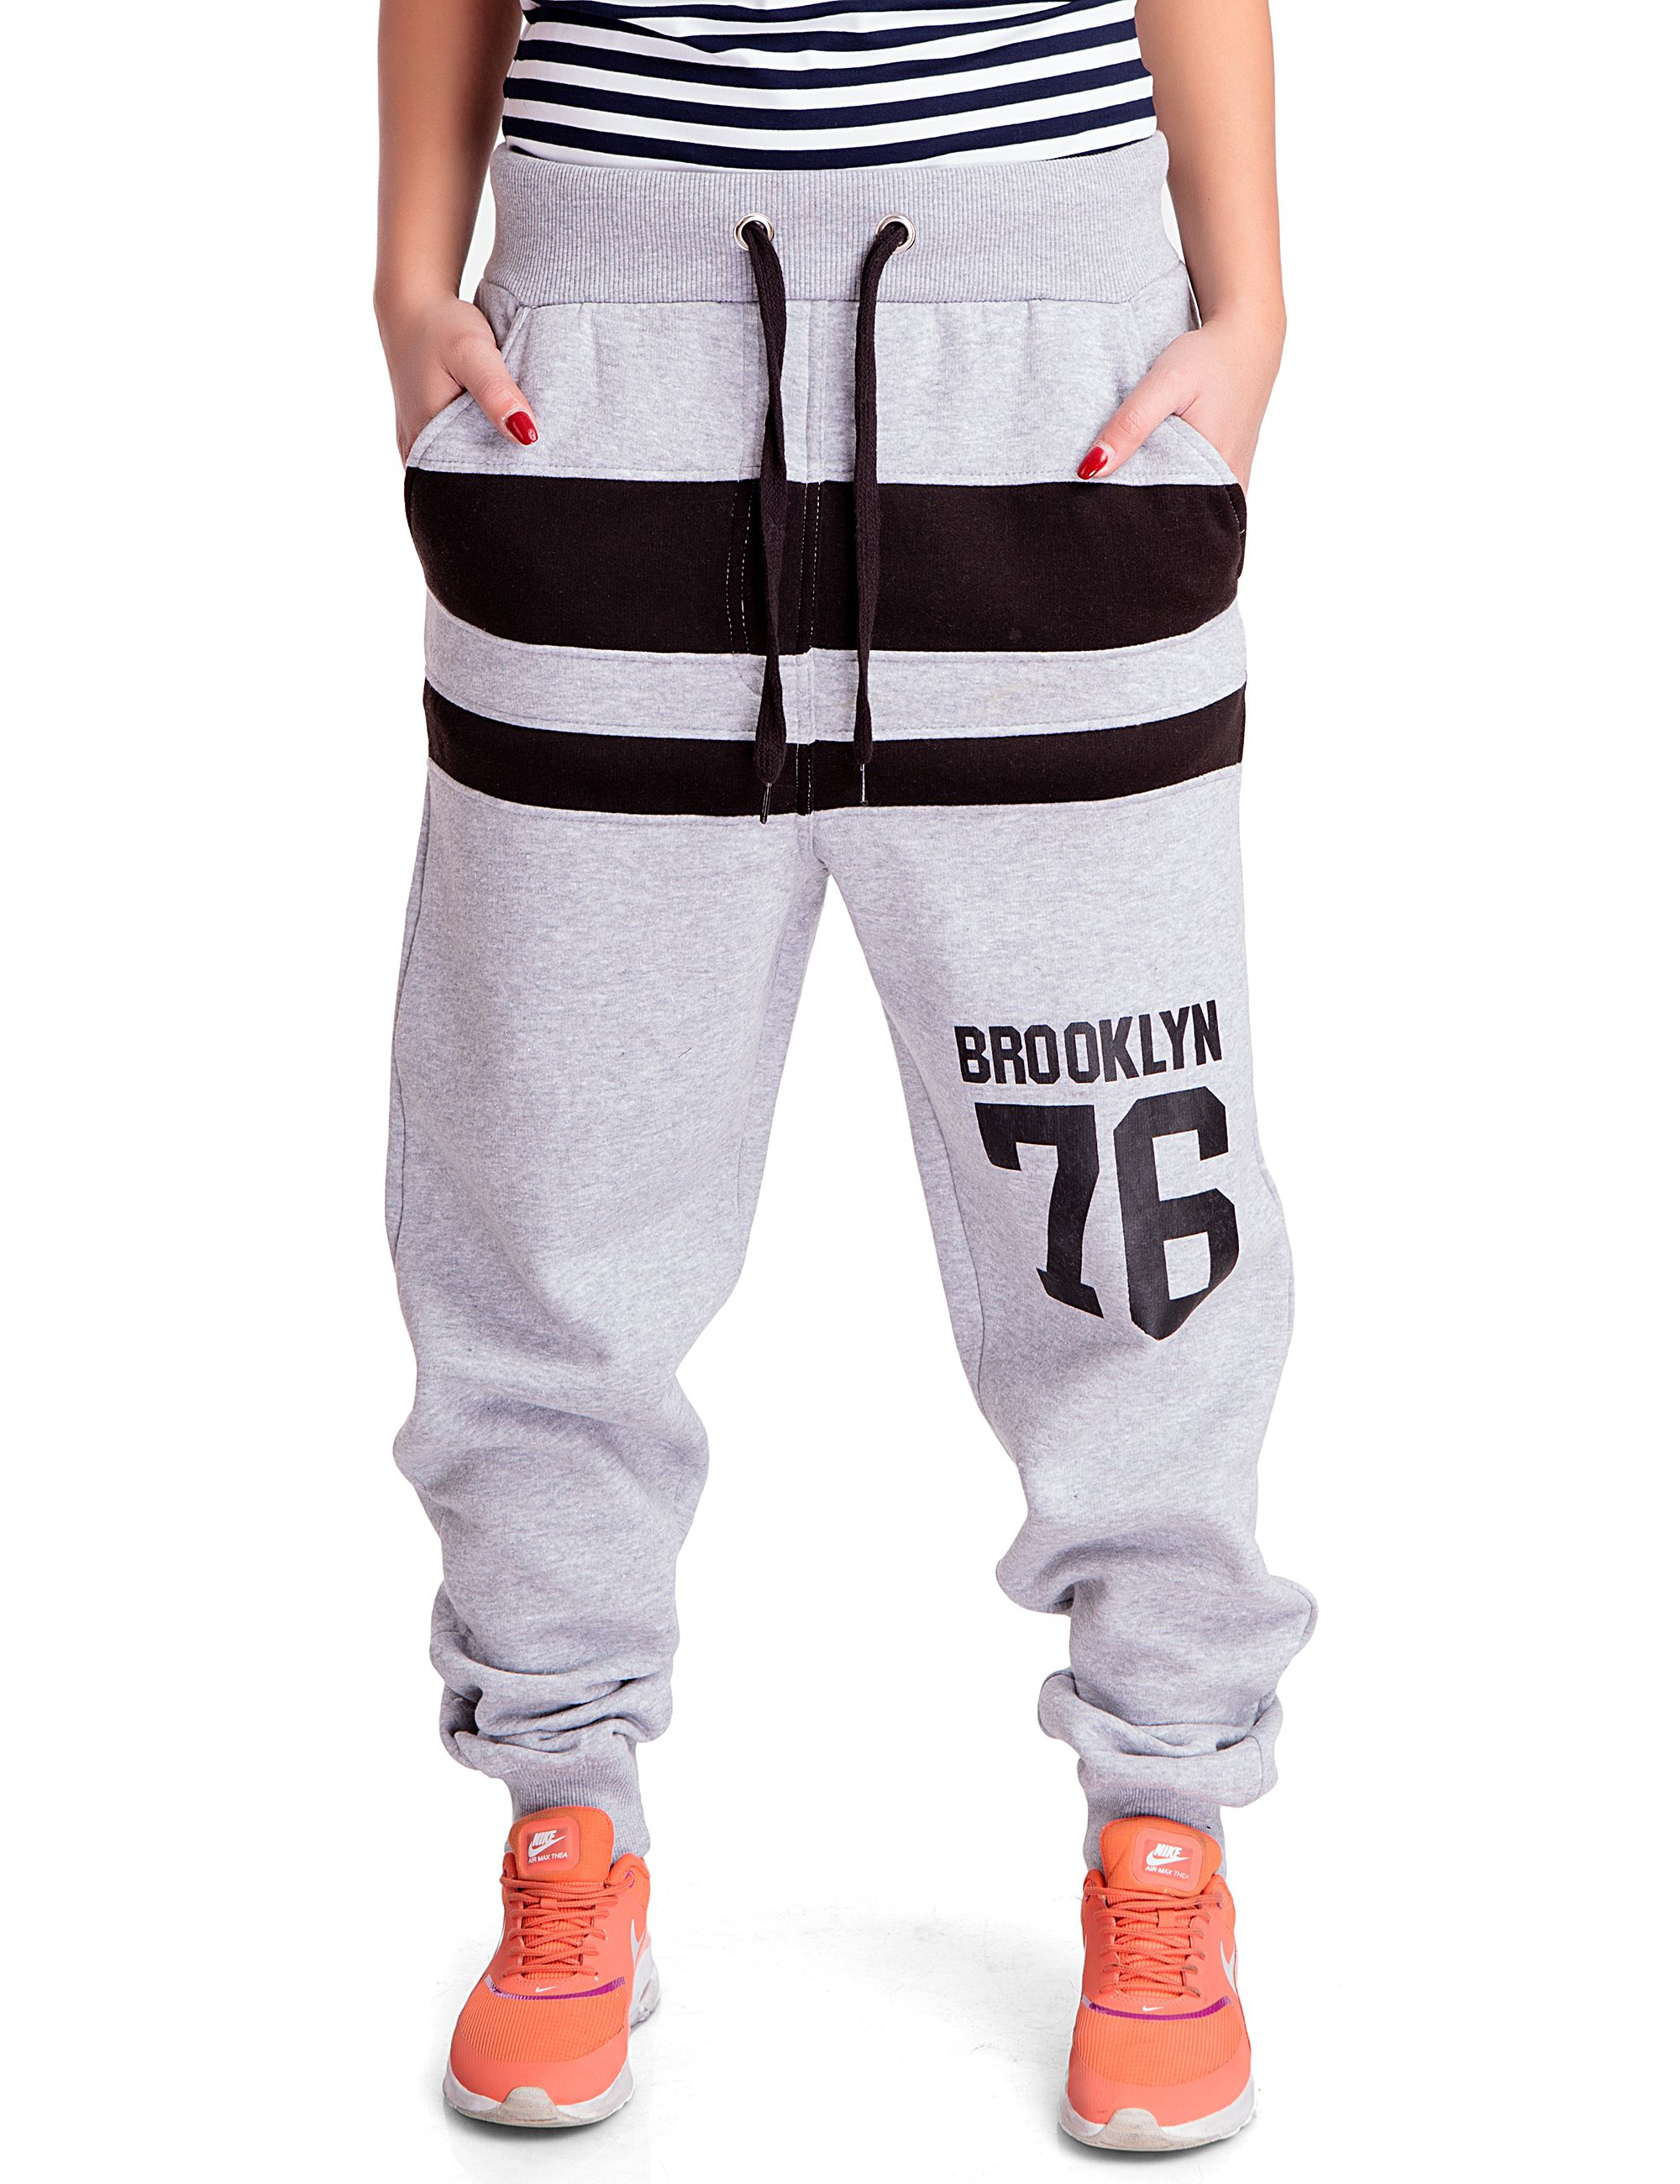 Hellgrau24brands Damen Brooklyn Sporthose 76 Fitness SqzMpLVUG